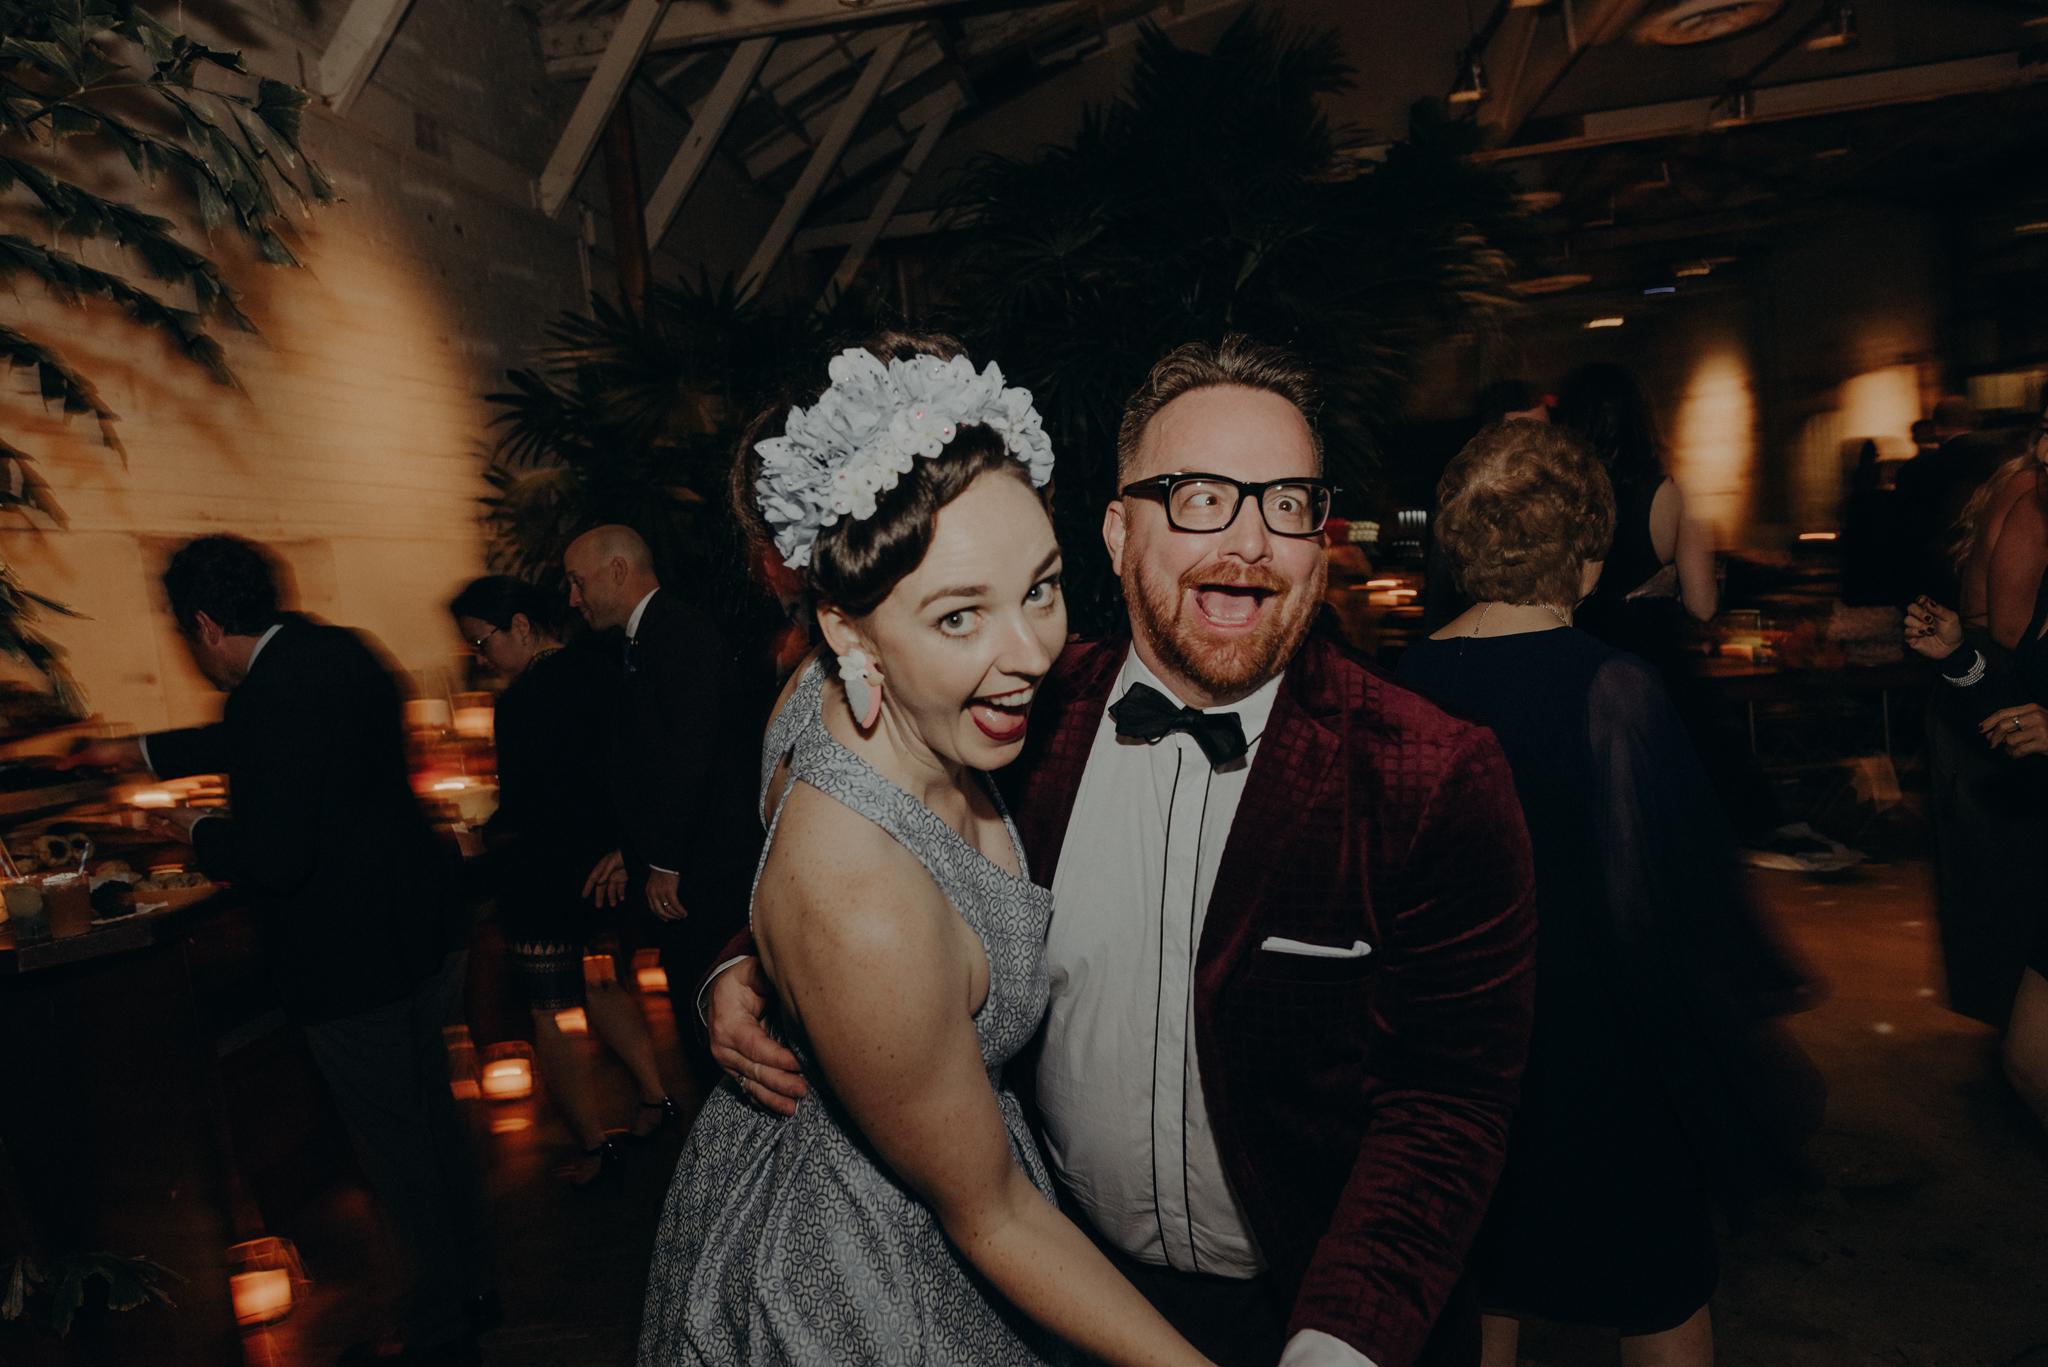 Wedding Photo LA - wedding photographer in los angeles - millwick wedding venue -isaiahandtaylor.com-138.jpg